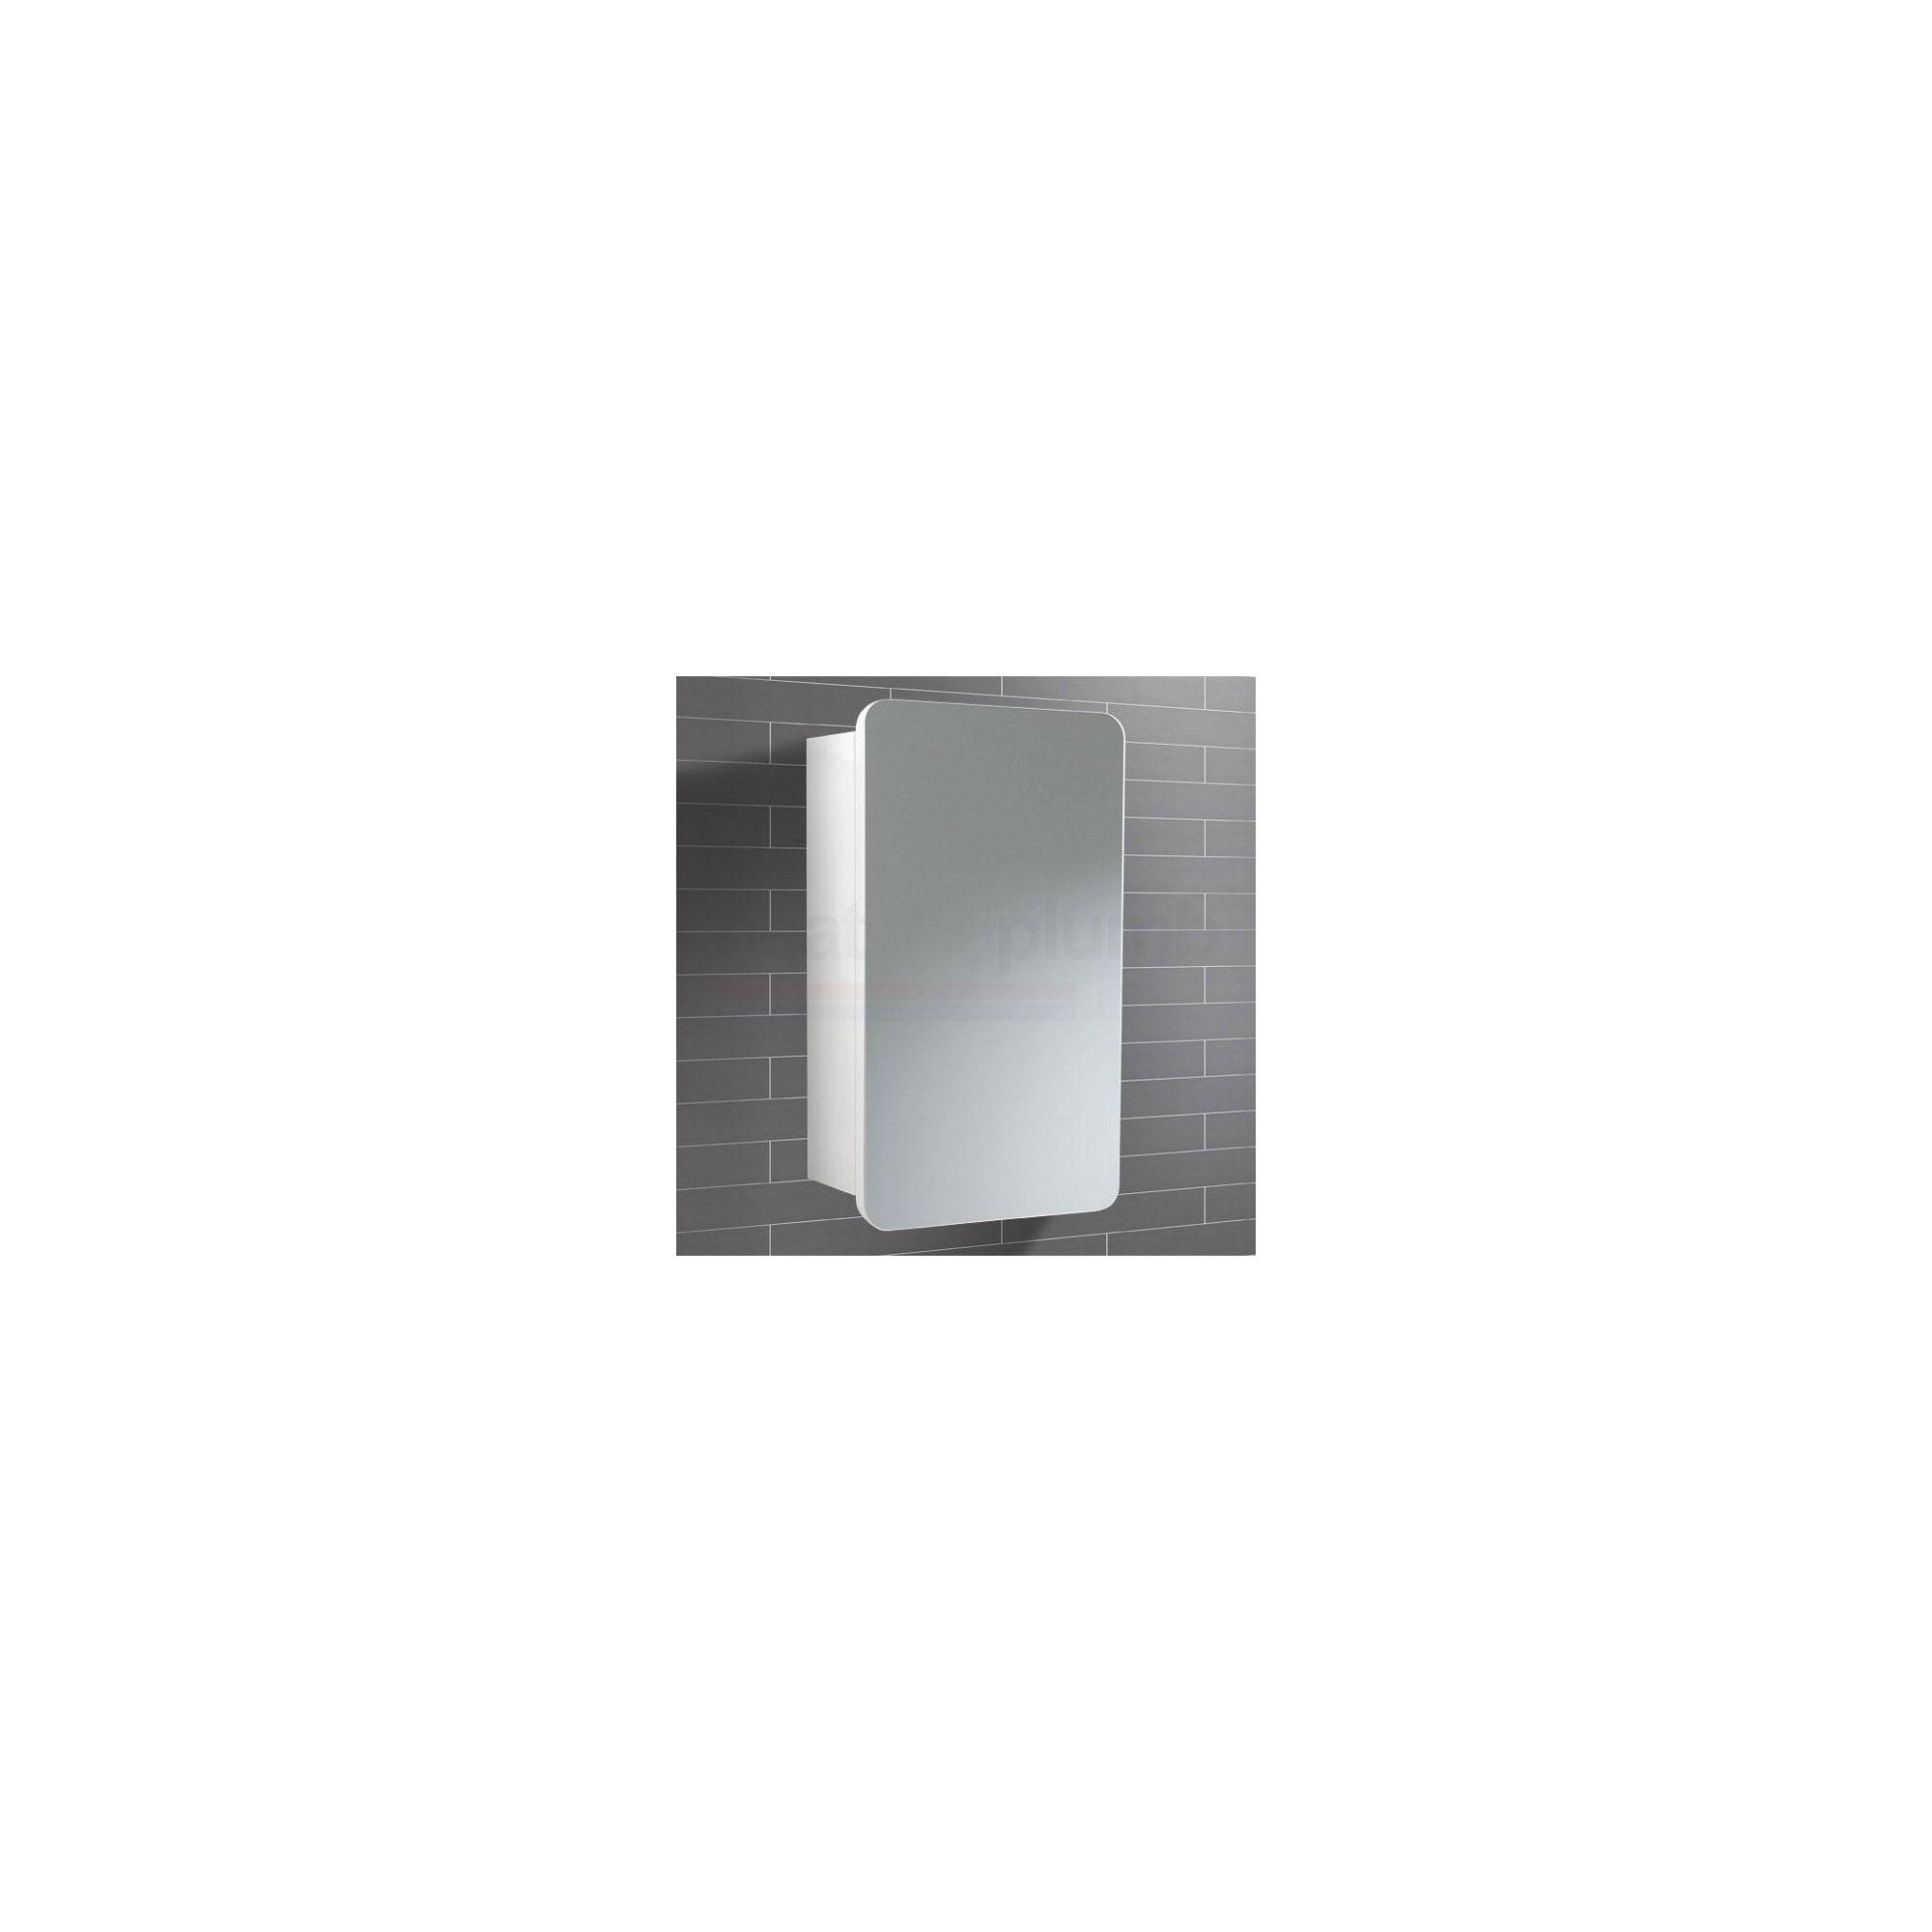 HiB Montana Mirrored Bathroom Cabinet 570mm High x 350mm Wide x 140mm Deep